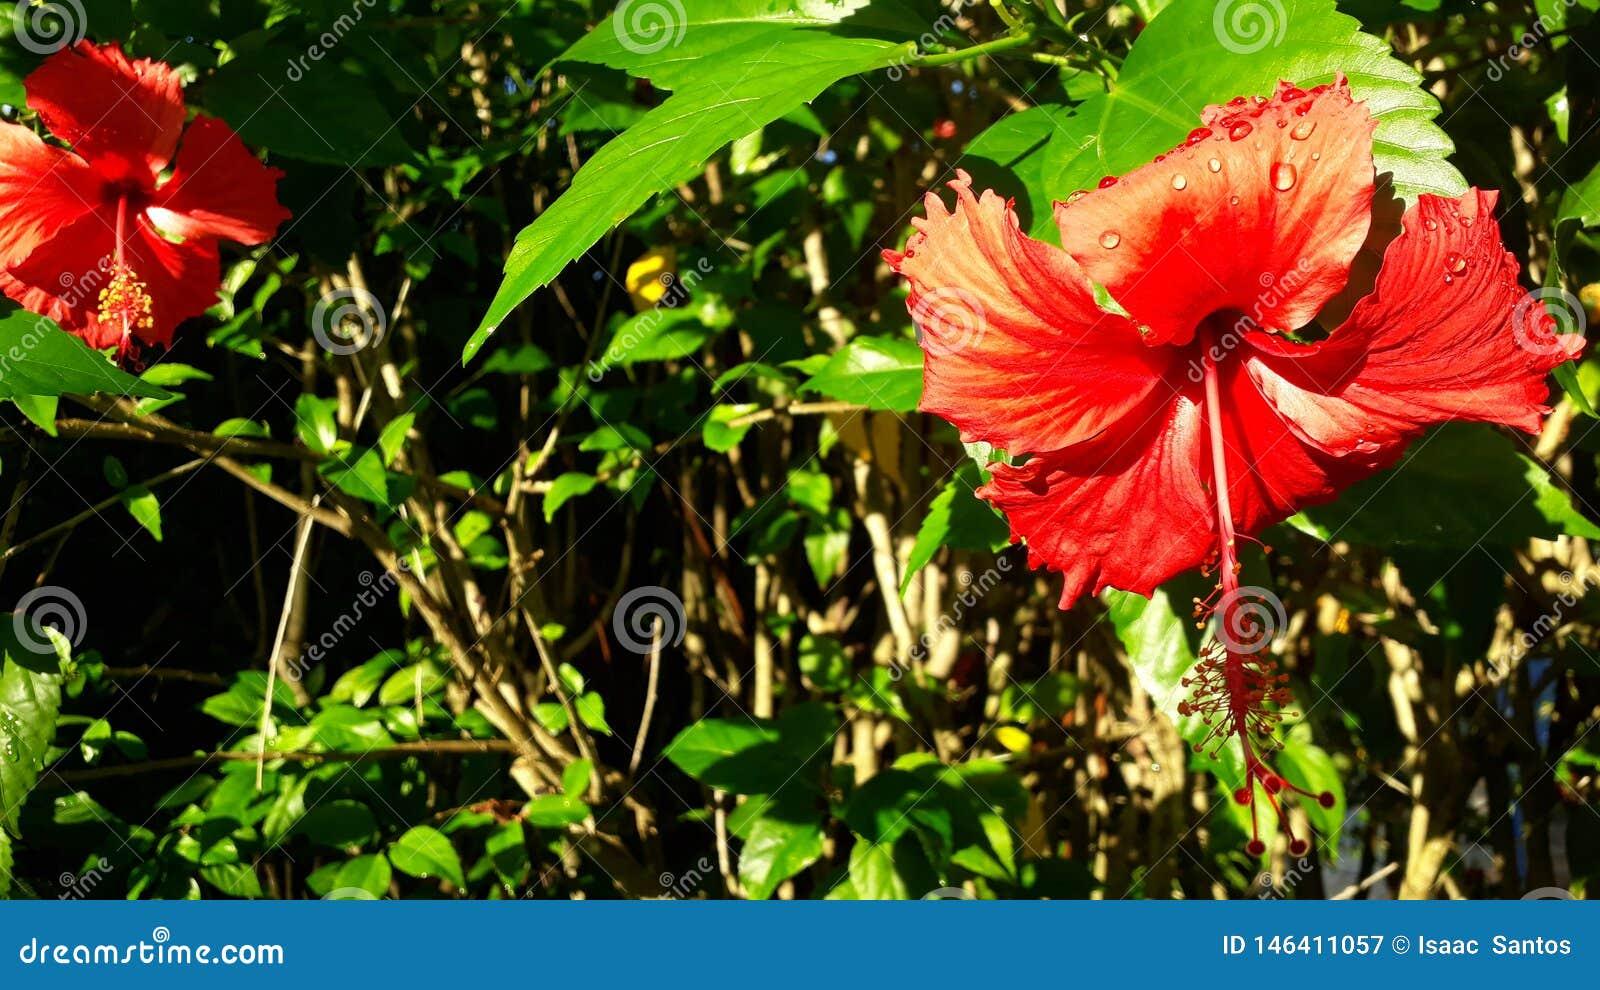 Red or orange flowers? Raindrops or sunlight?